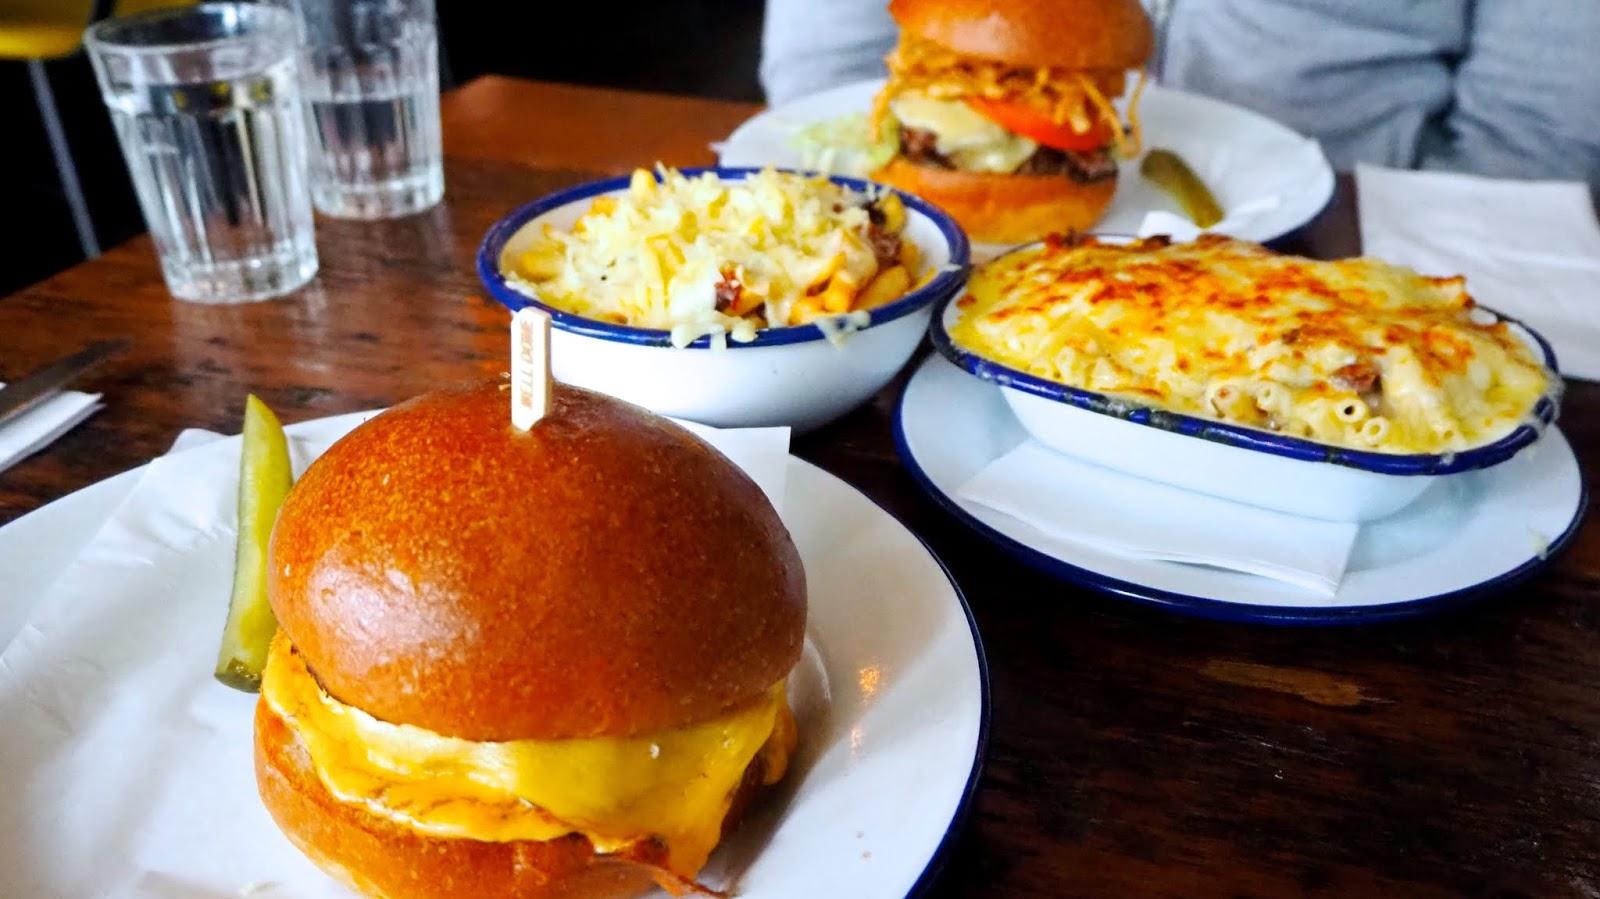 burgers, fries and mac & cheese